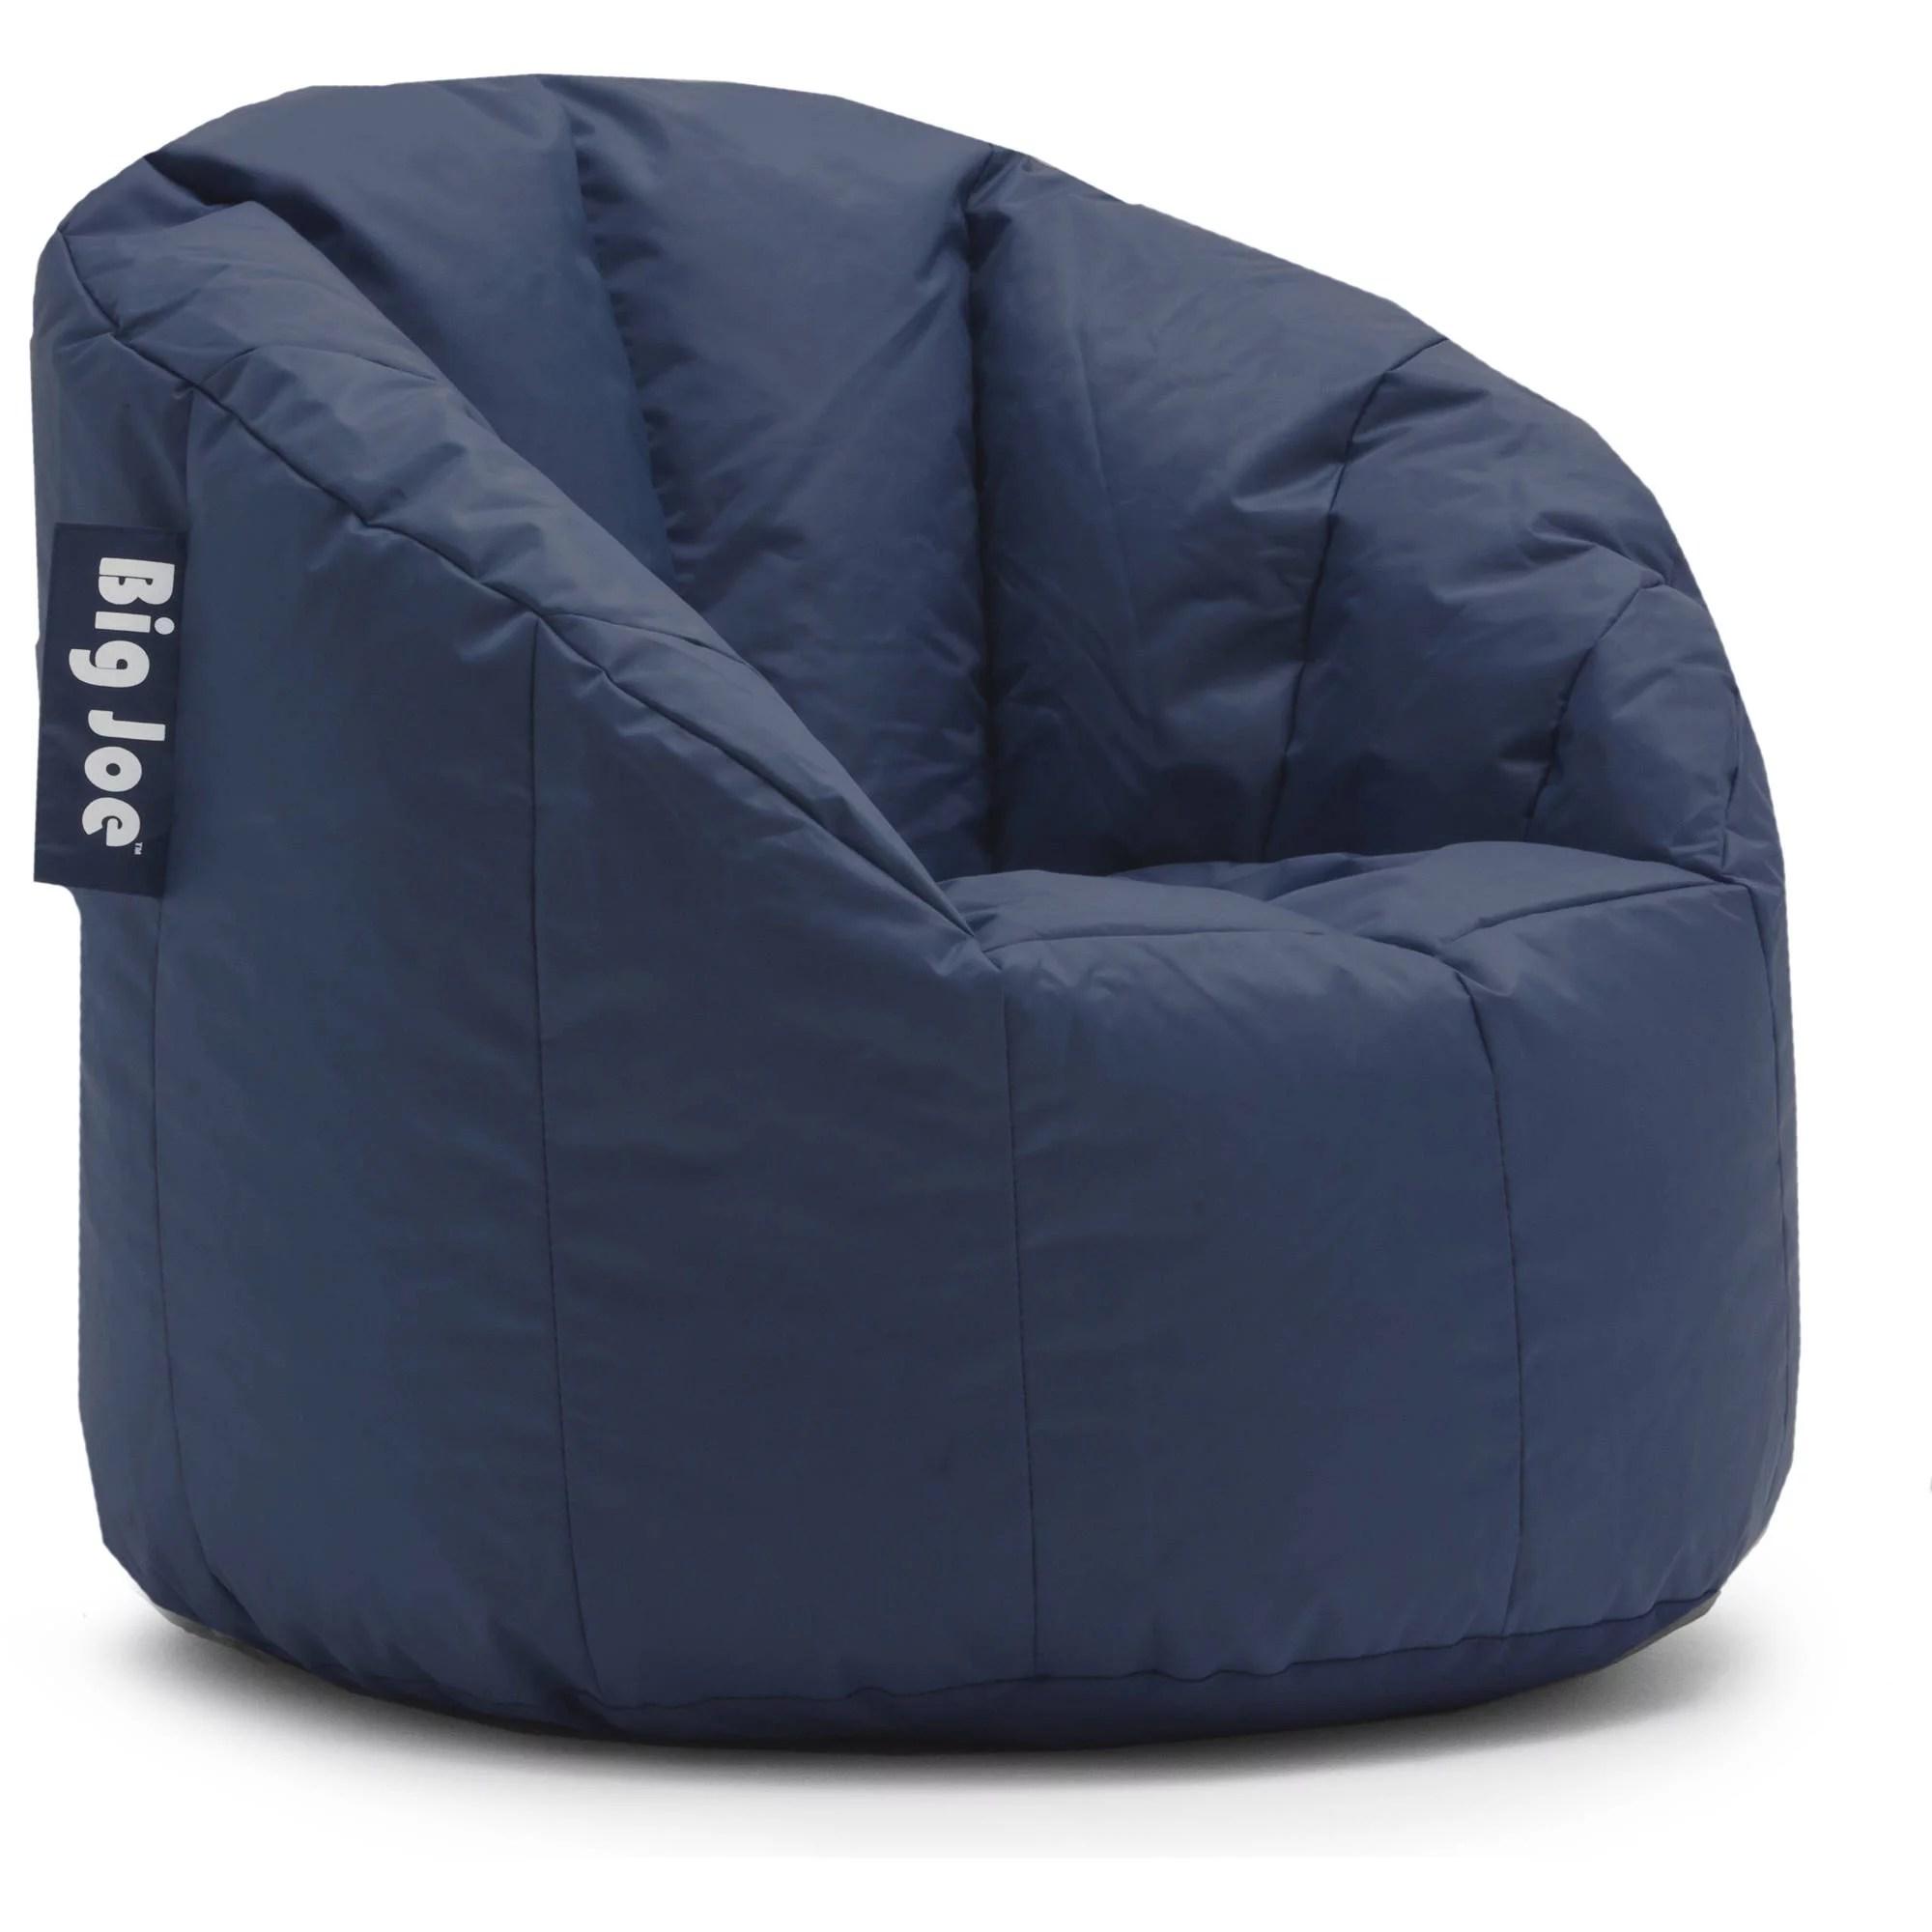 big joe milano bean bag chair multiple colors 32 x 28 x 25